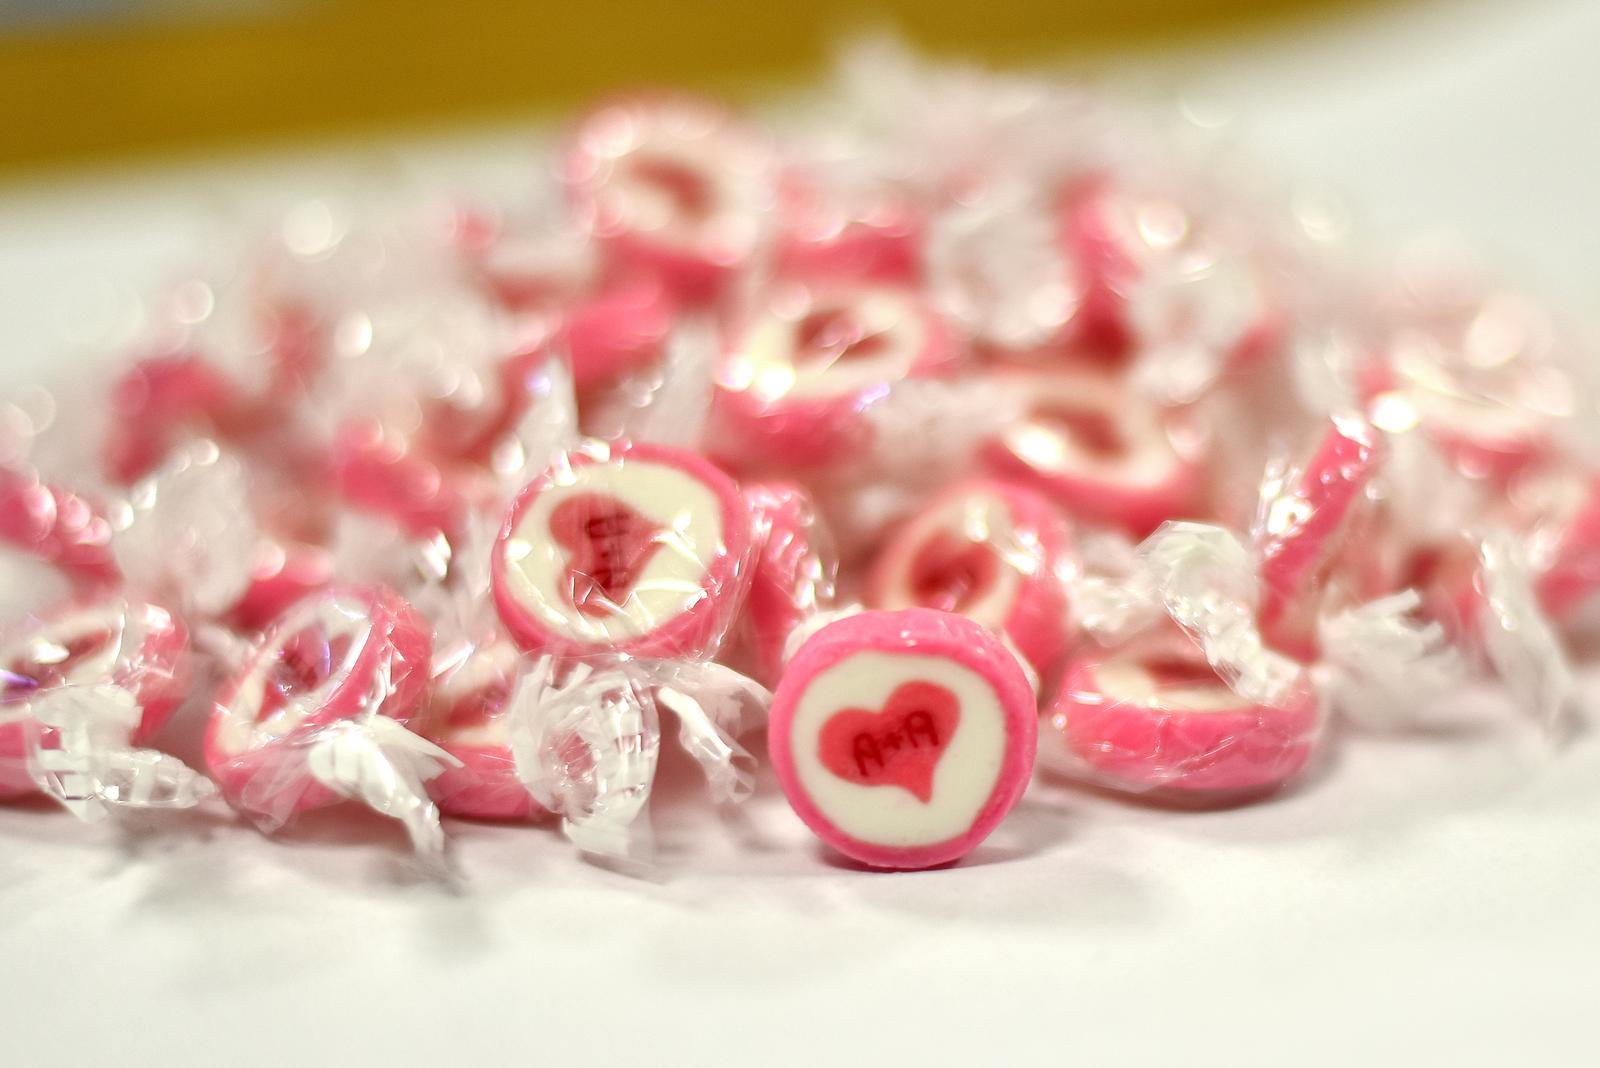 Svadobné cukríky - Obrázok č. 3